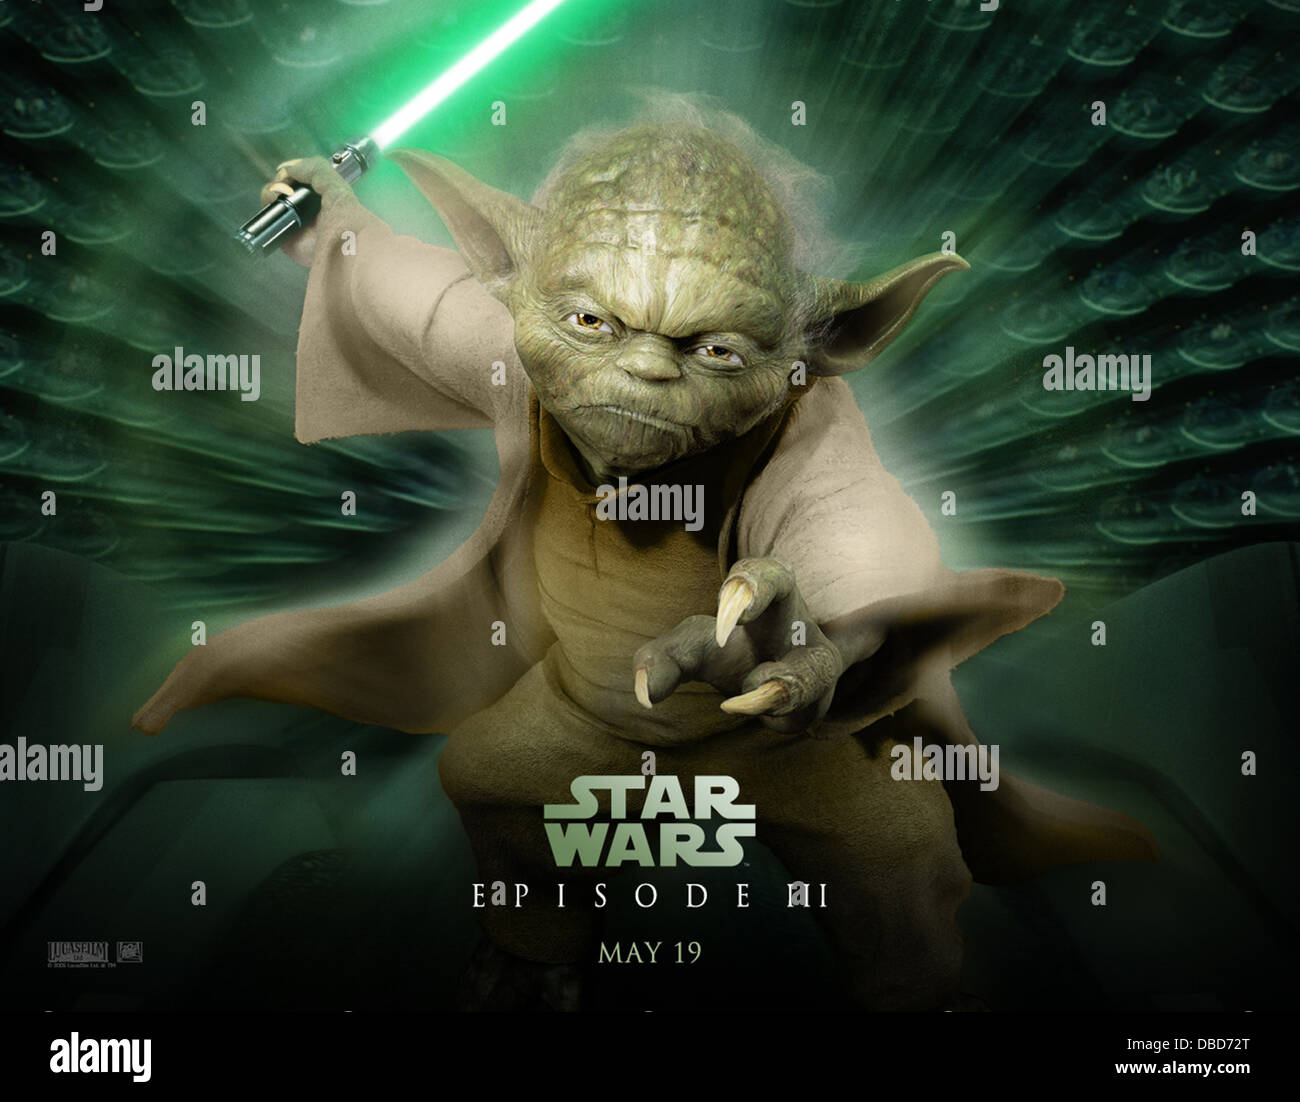 Star Wars Episode Iii Revenge Of The Sith Poster 2005 Yoda Stock Photo Alamy